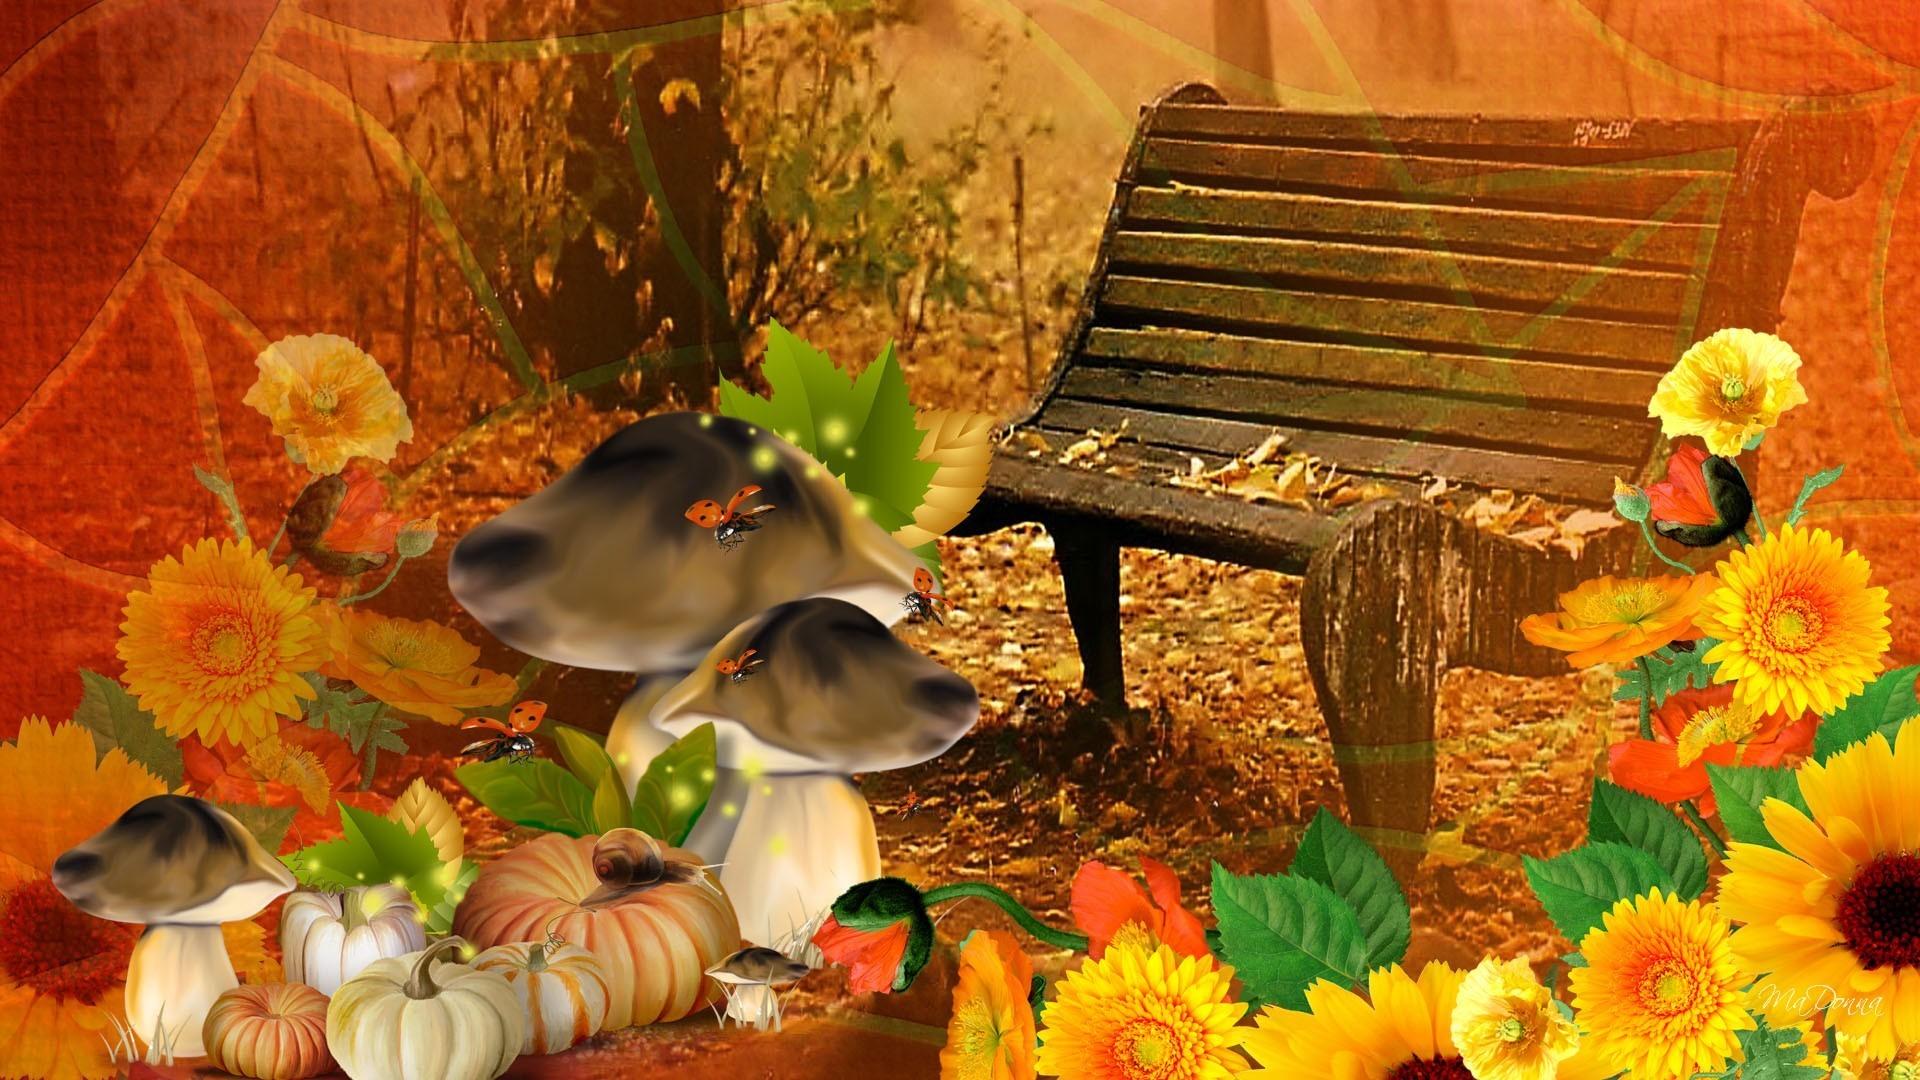 Pumpkin Tag – Bright Fall Day Autumn Flowers Harvest Ladybugs Mushrooms  Gourds Fleurs Pumpkin October Thanksgiving